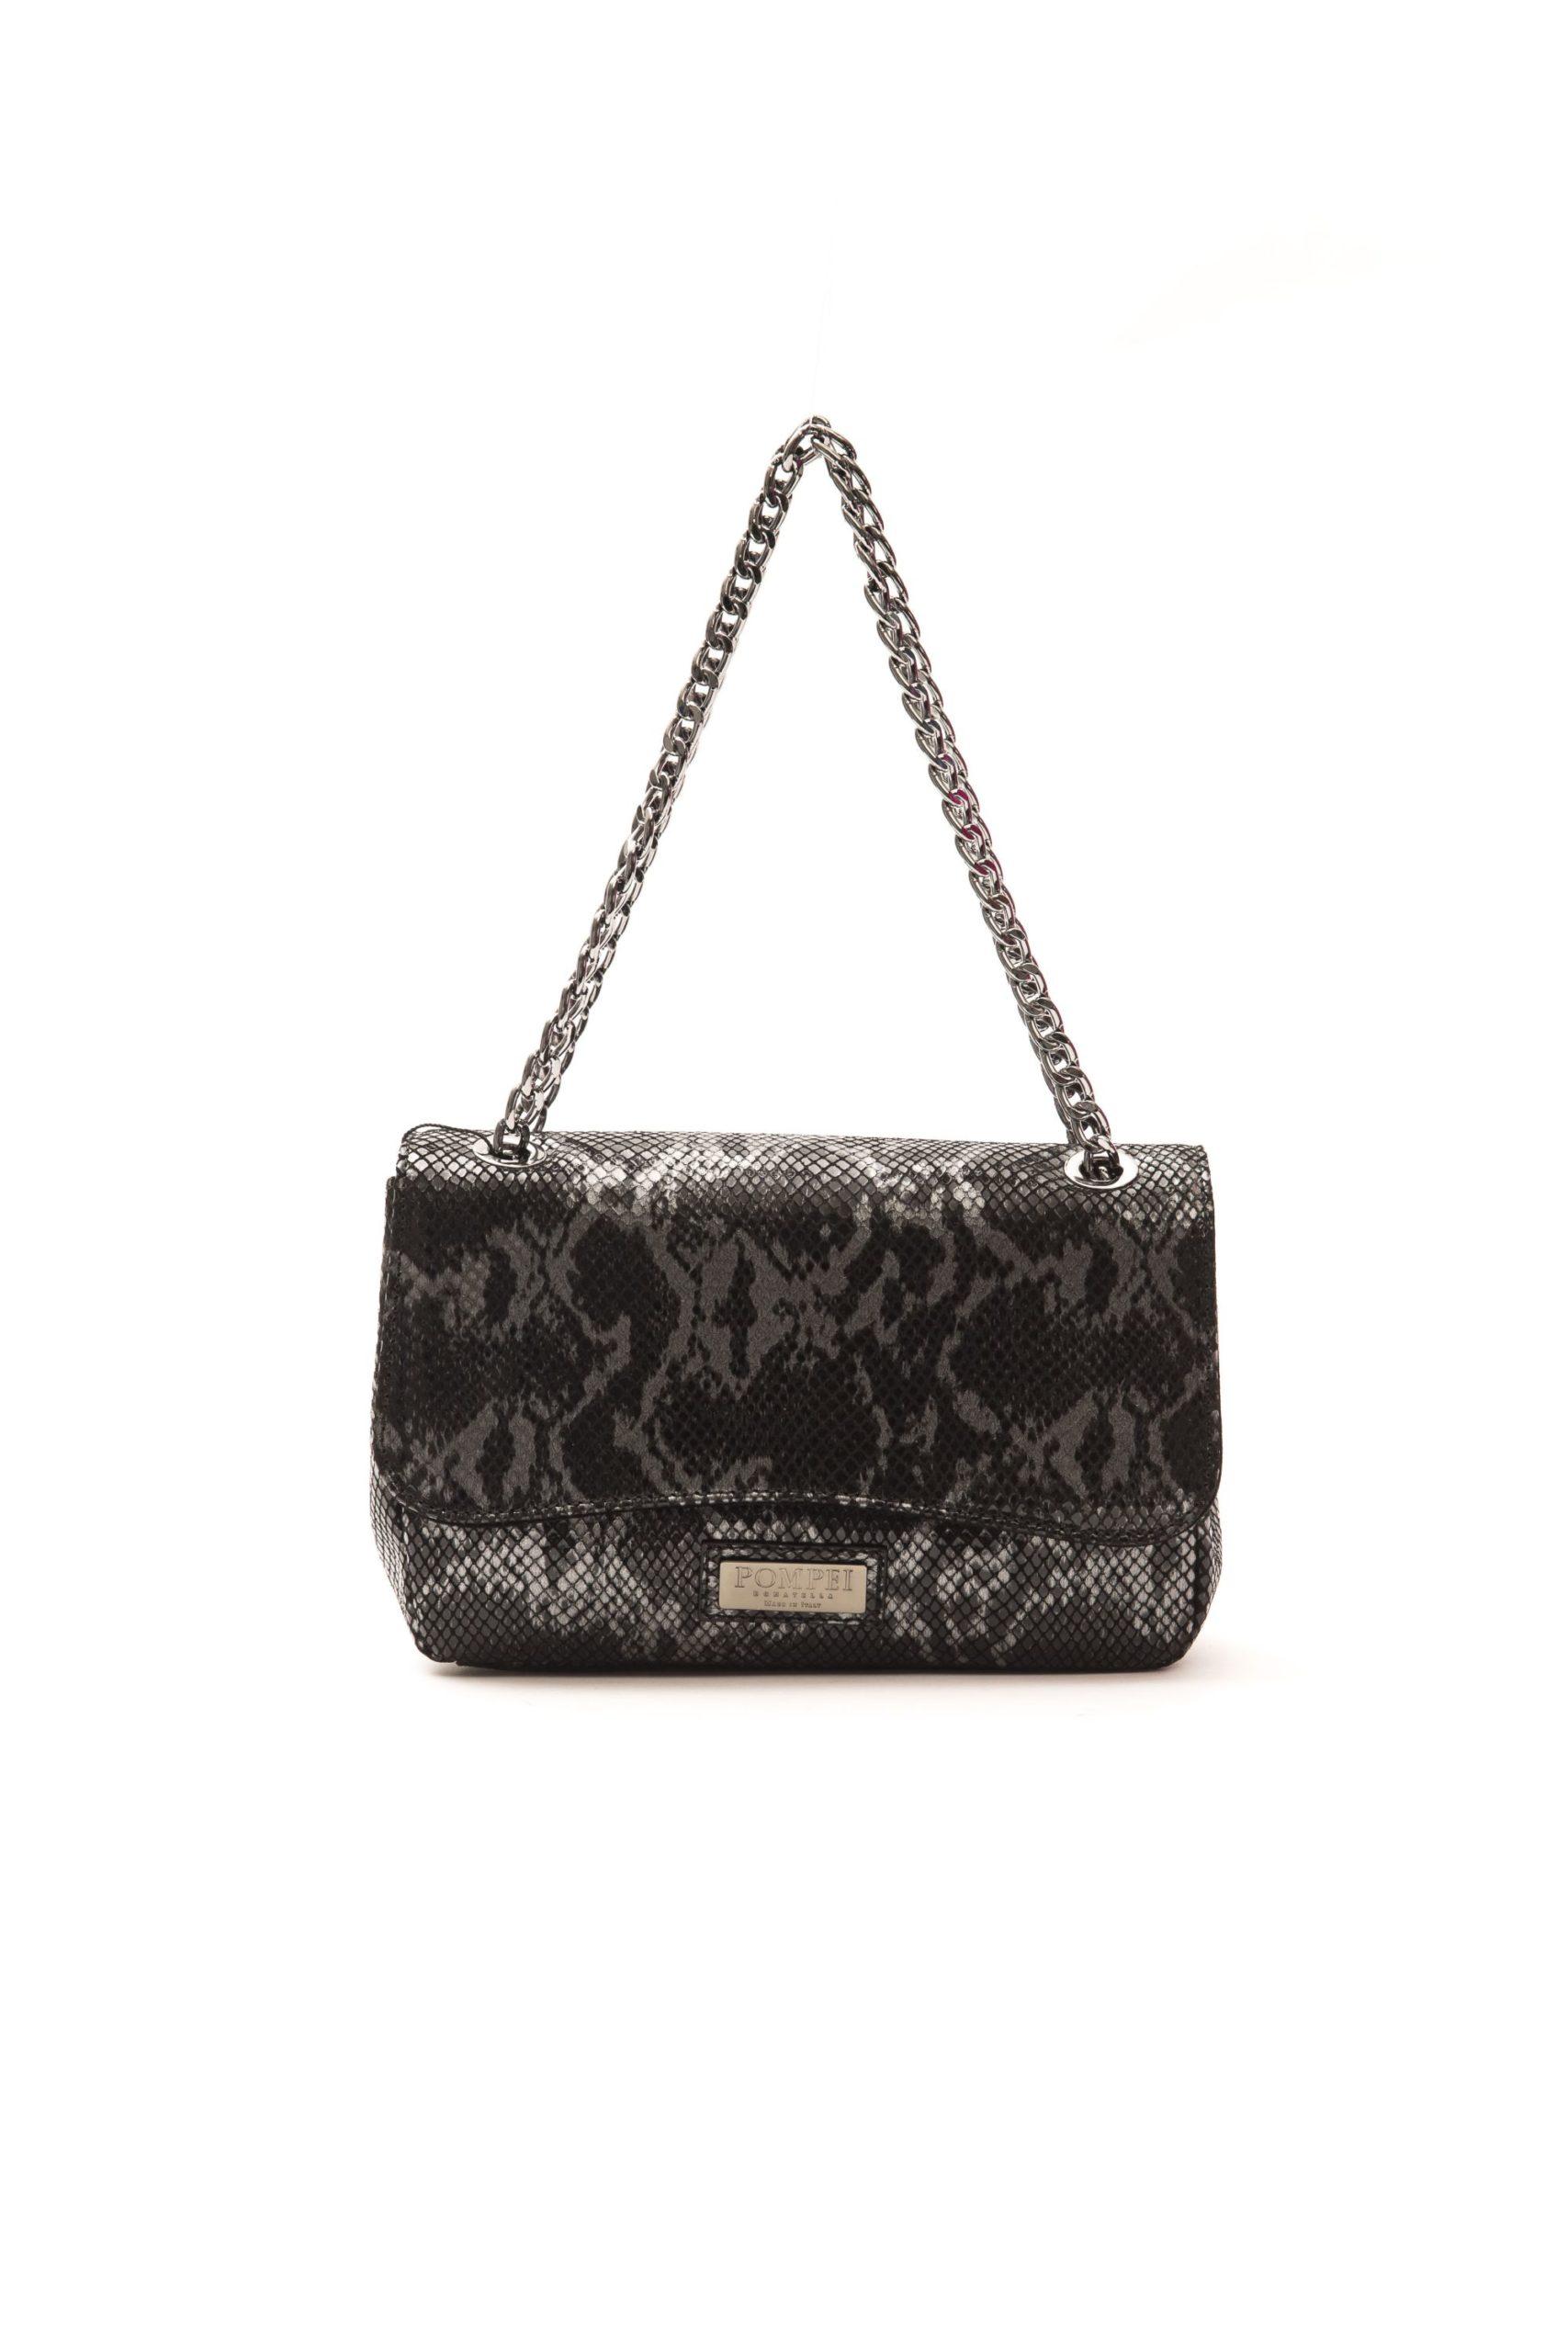 Pompei Donatella Women's Grigio Crossbody Bag Grey PO1004843